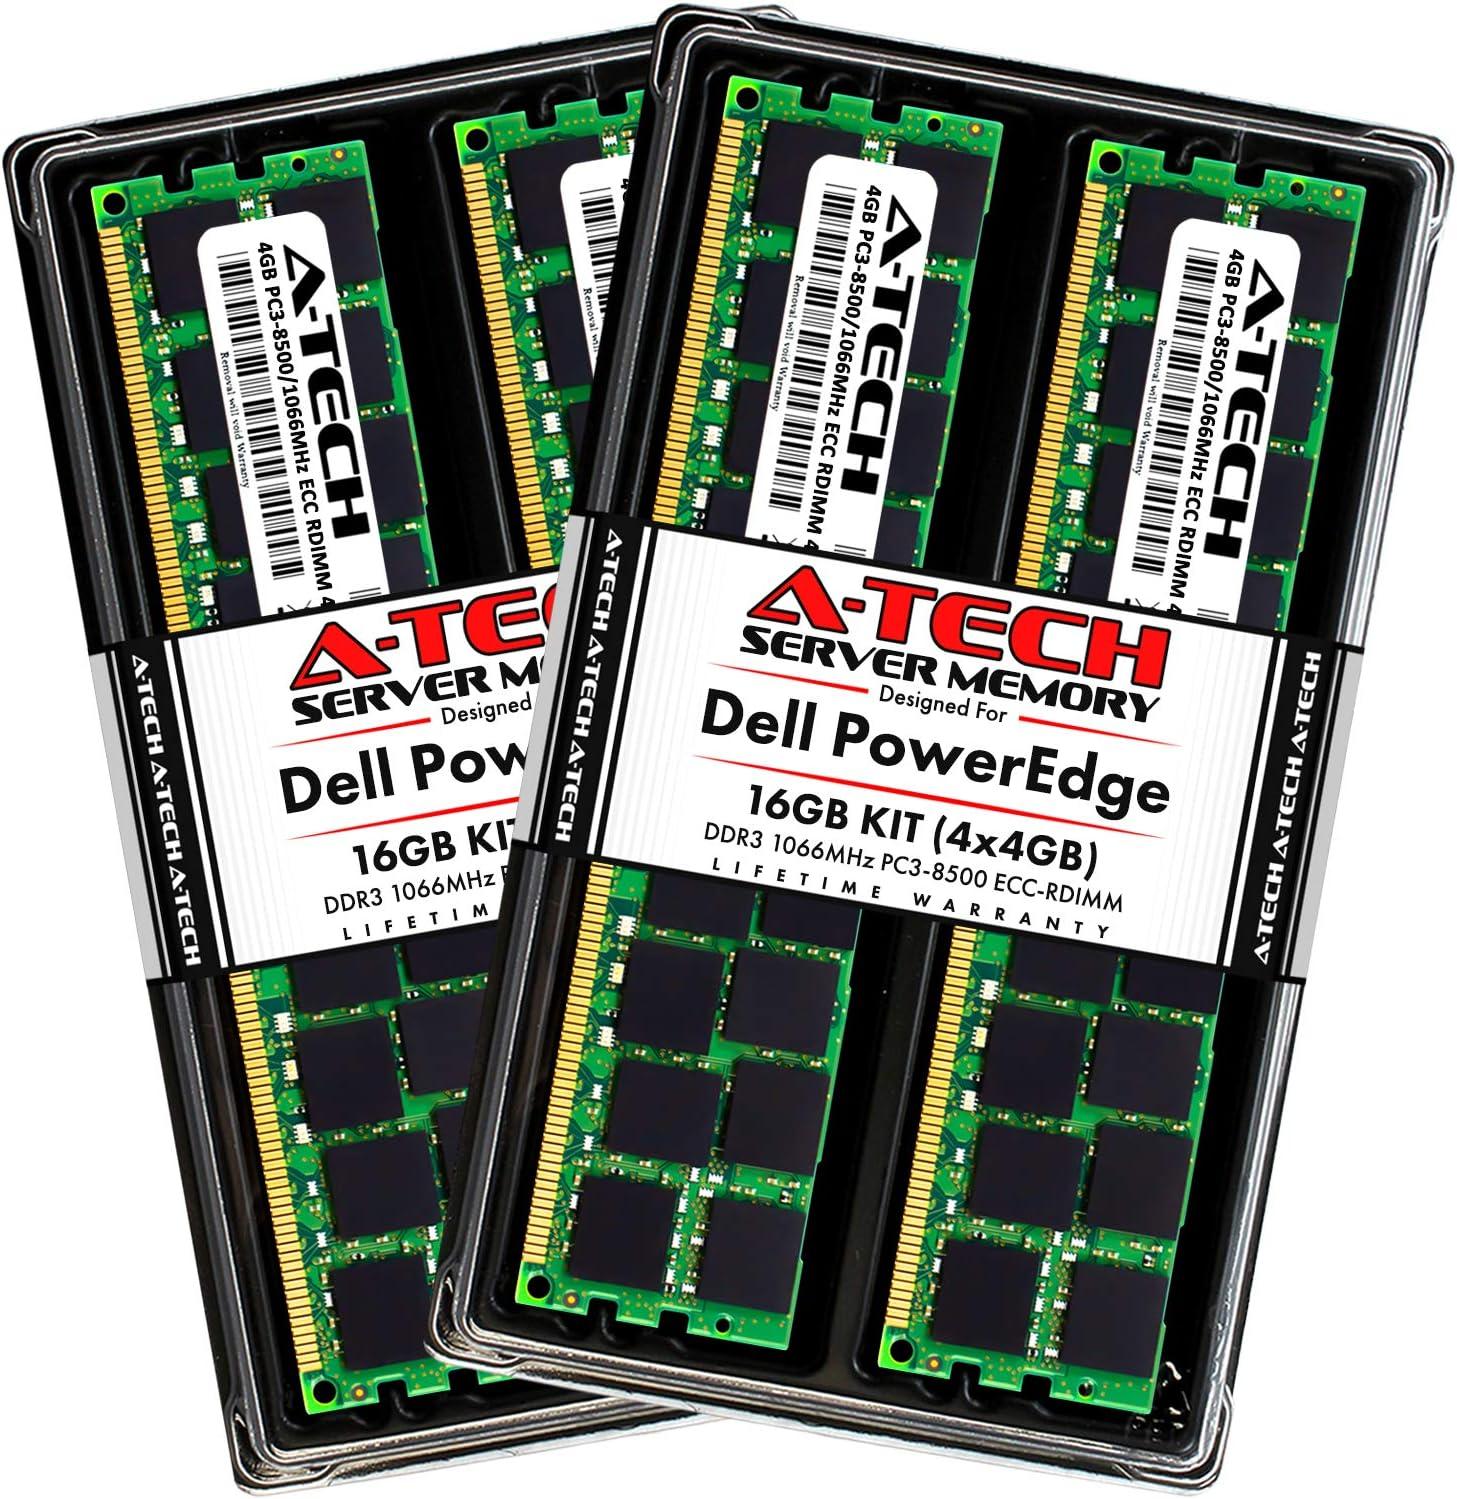 A-Tech 16GB (4x4GB) RAM for Dell PowerEdge R310, T310 Servers | DDR3 1066MHz ECC-RDIMM PC3-8500 4Rx8 1.5V 240-Pin ECC Registered DIMM Server Memory Upgrade Kit